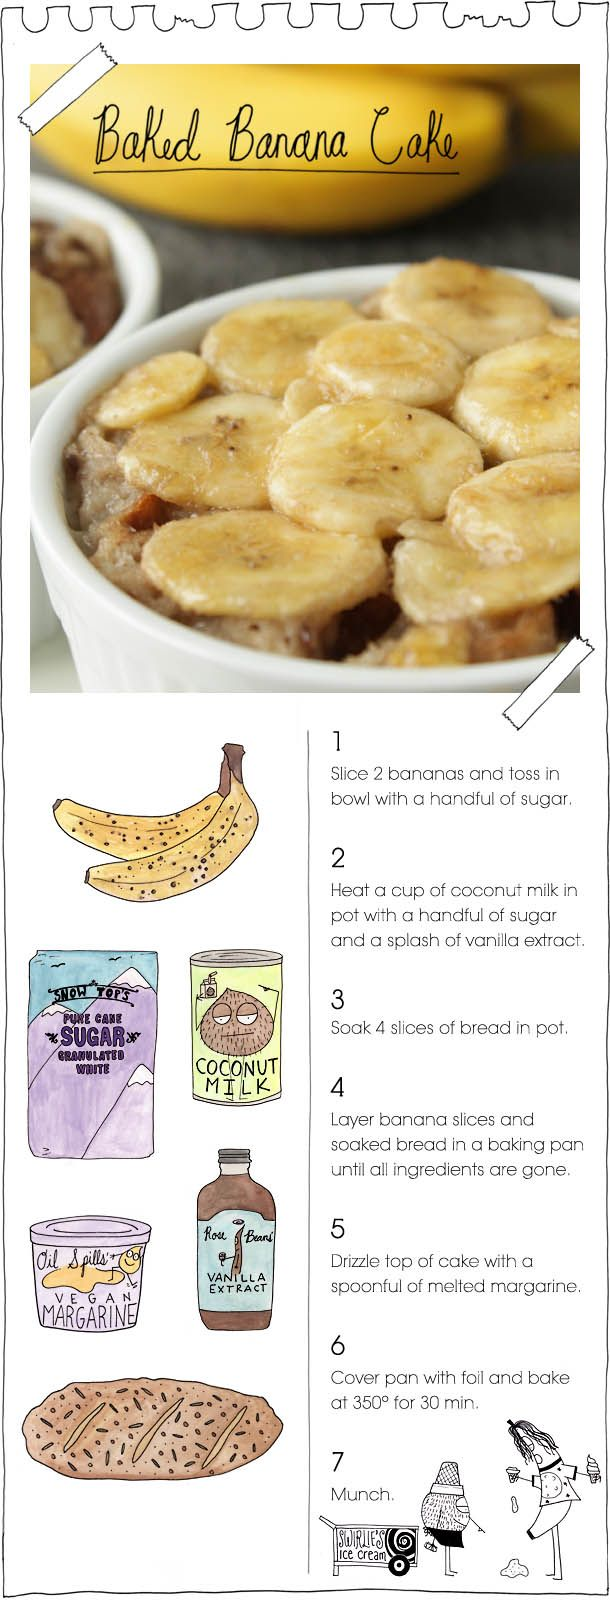 Baked Banana Cake